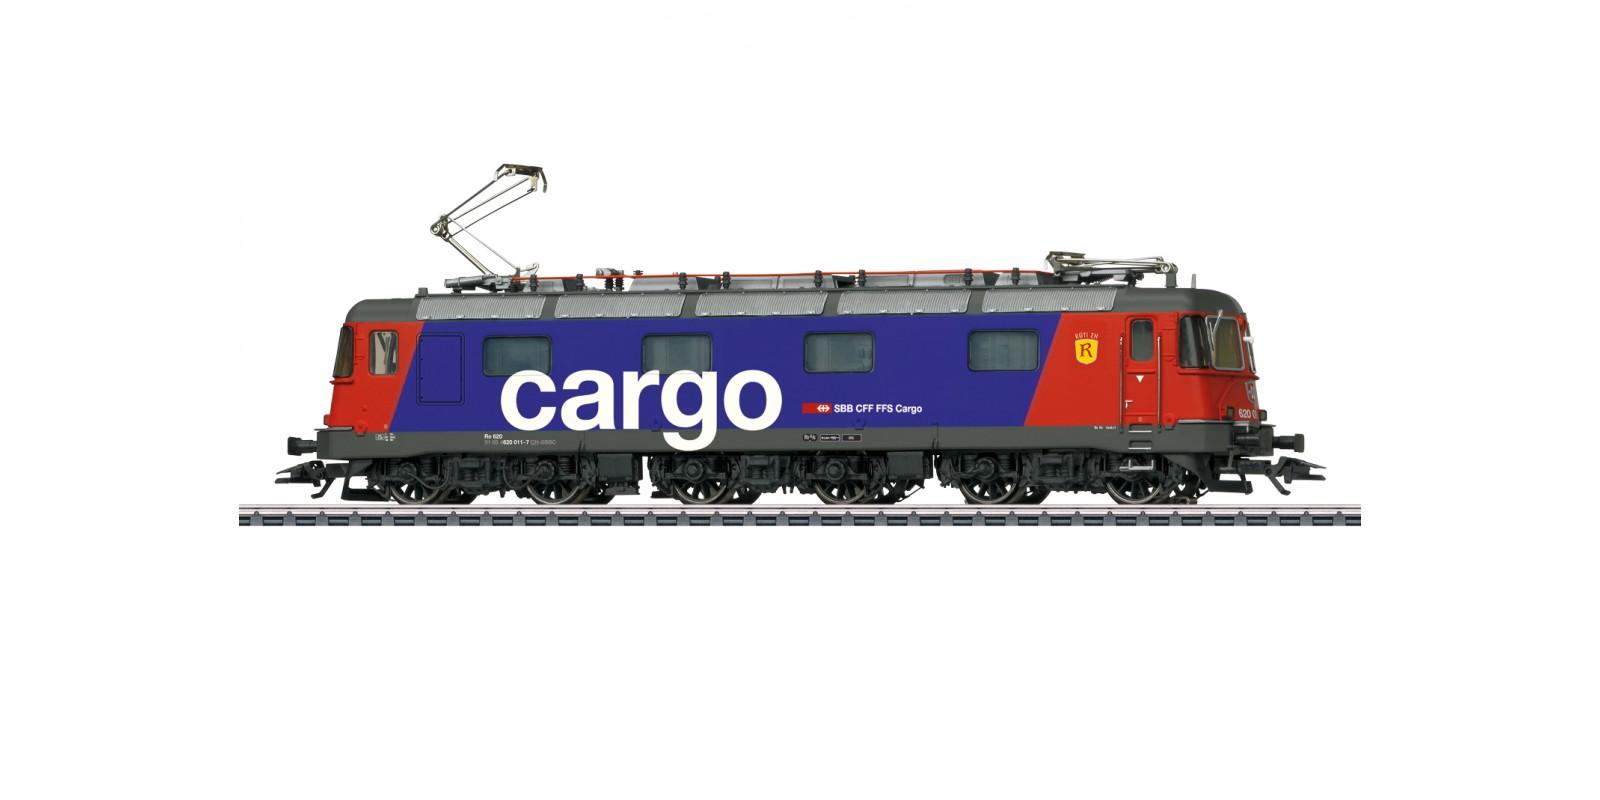 37327 Class Re 620 Electric Locomotive